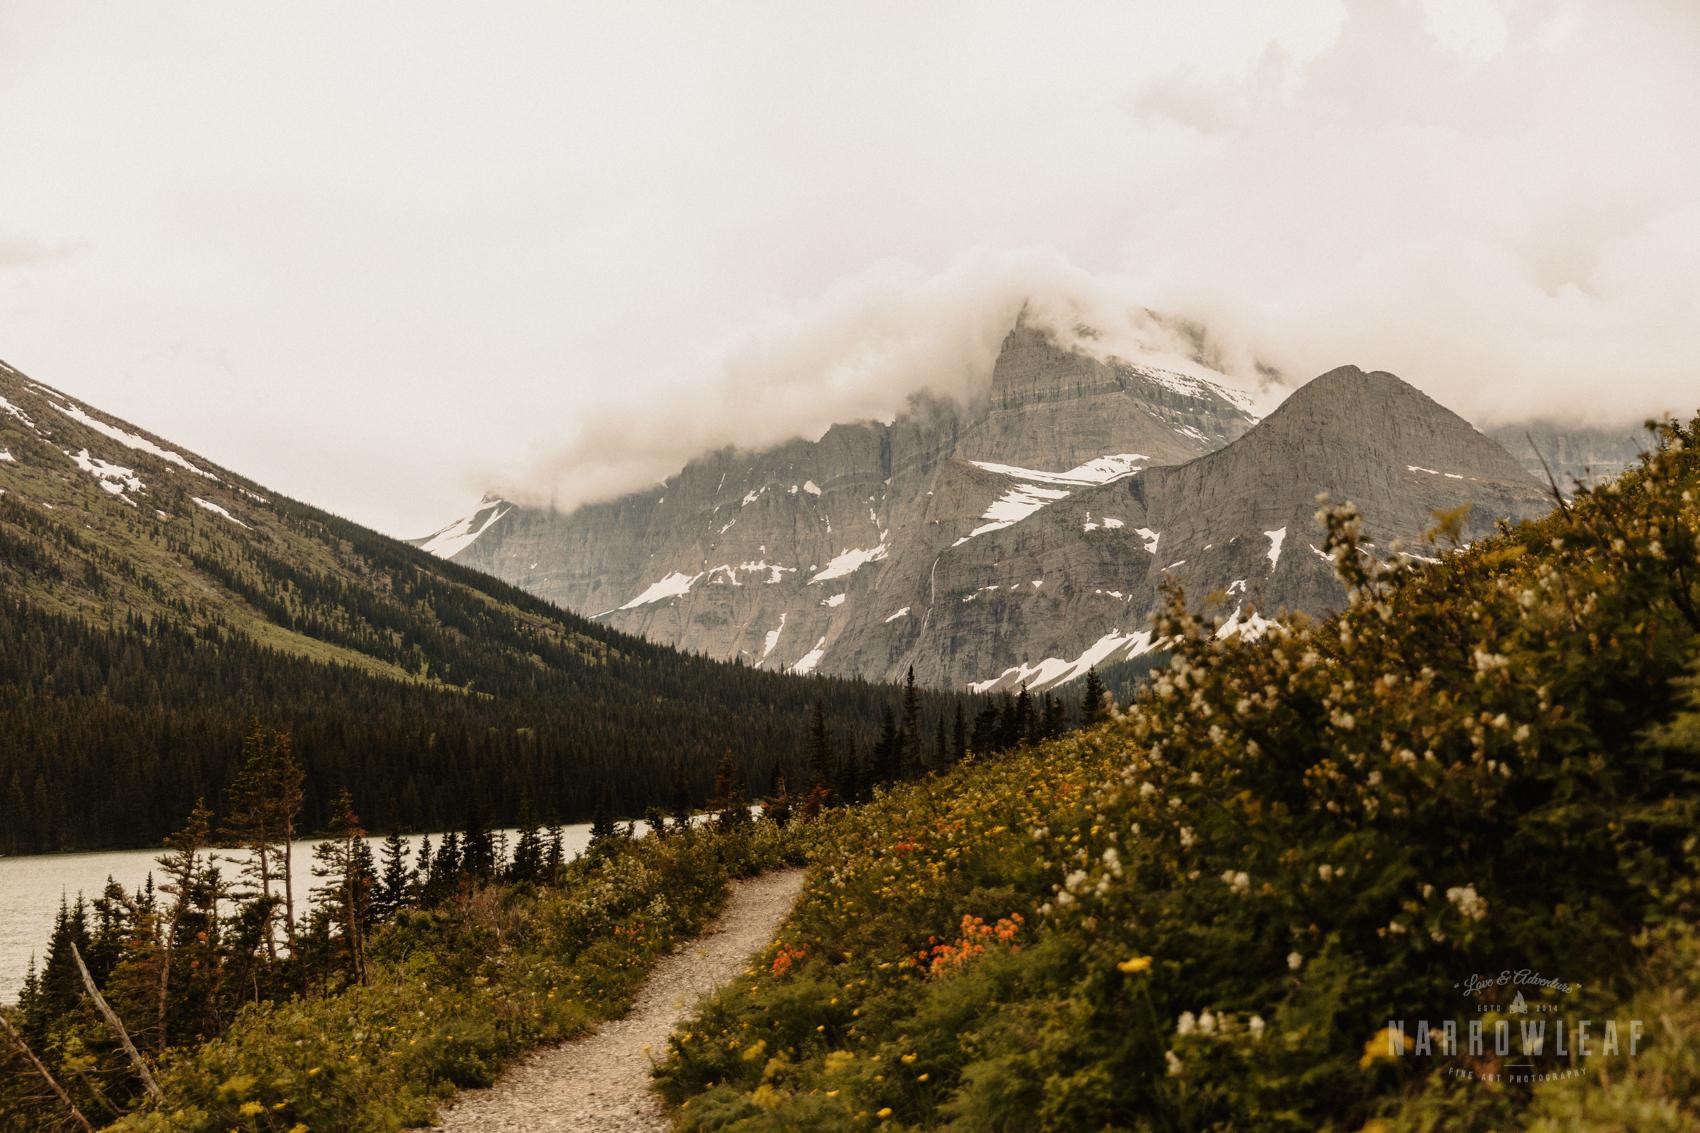 Montana-Glacier-National-Park-Many-Glacier-Narrowleaf-Love-and-Adventure-elopement-Photography-9816.jpg